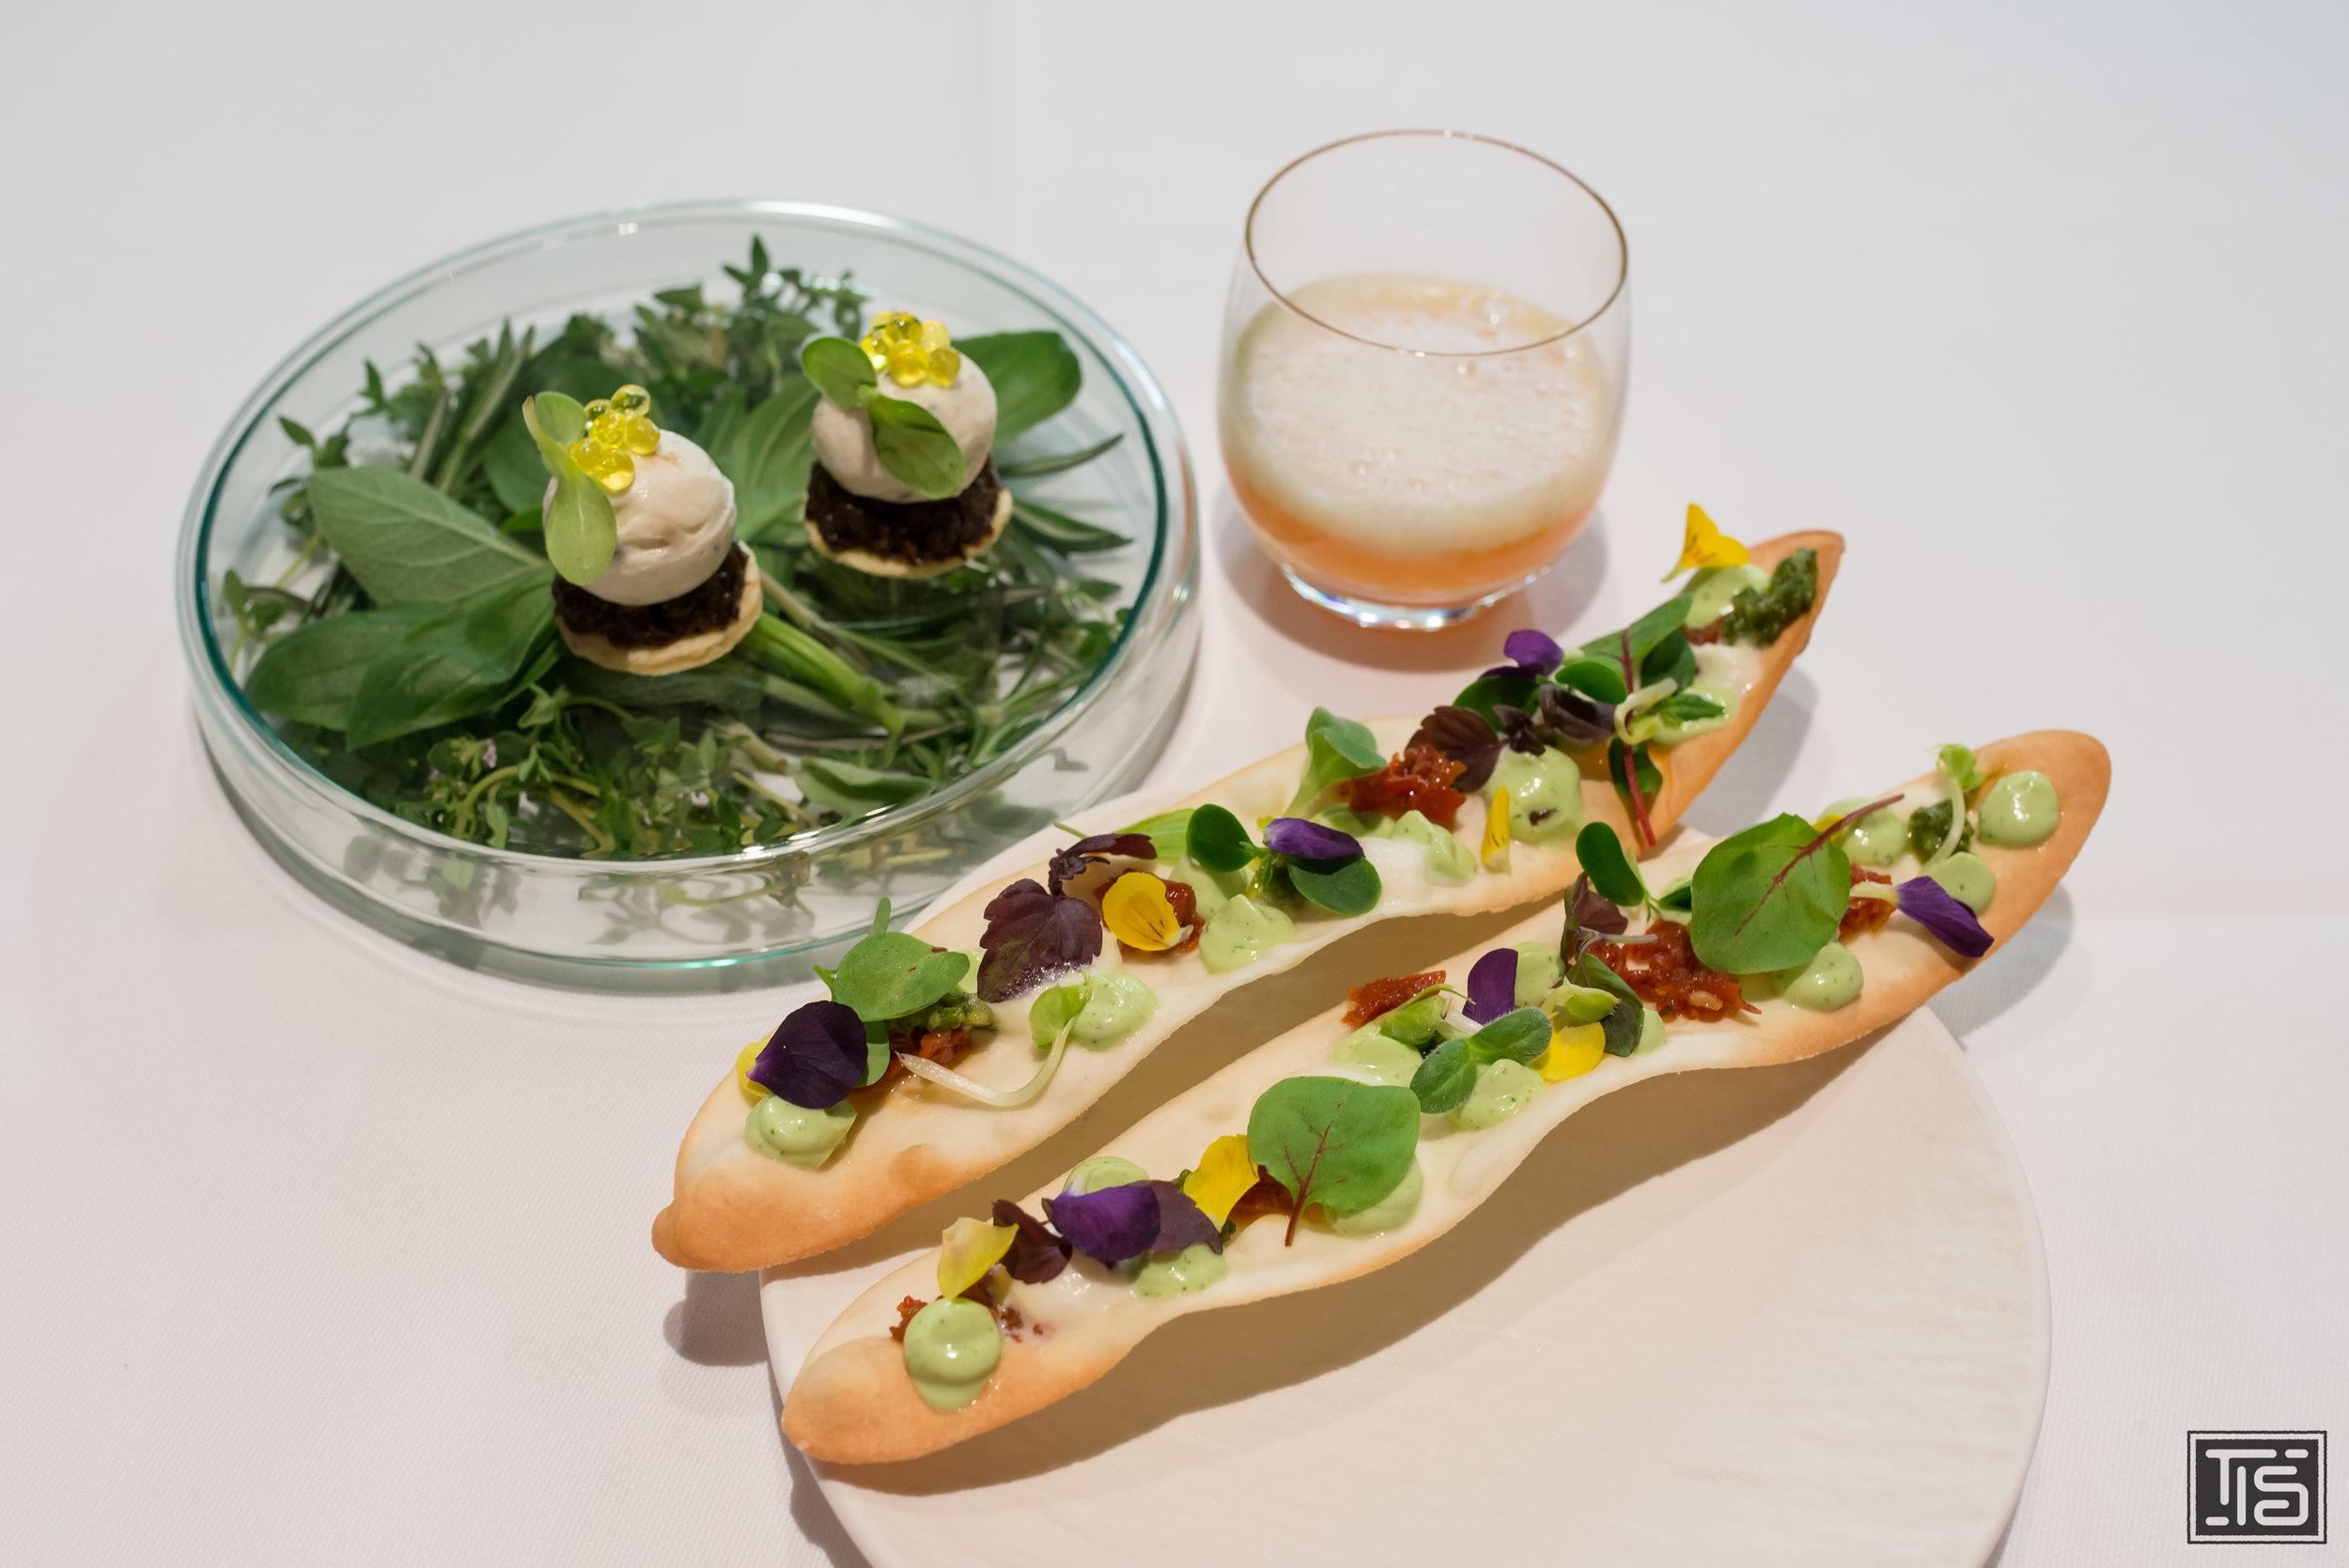 jaegerhof_agron_lleshi_snacks